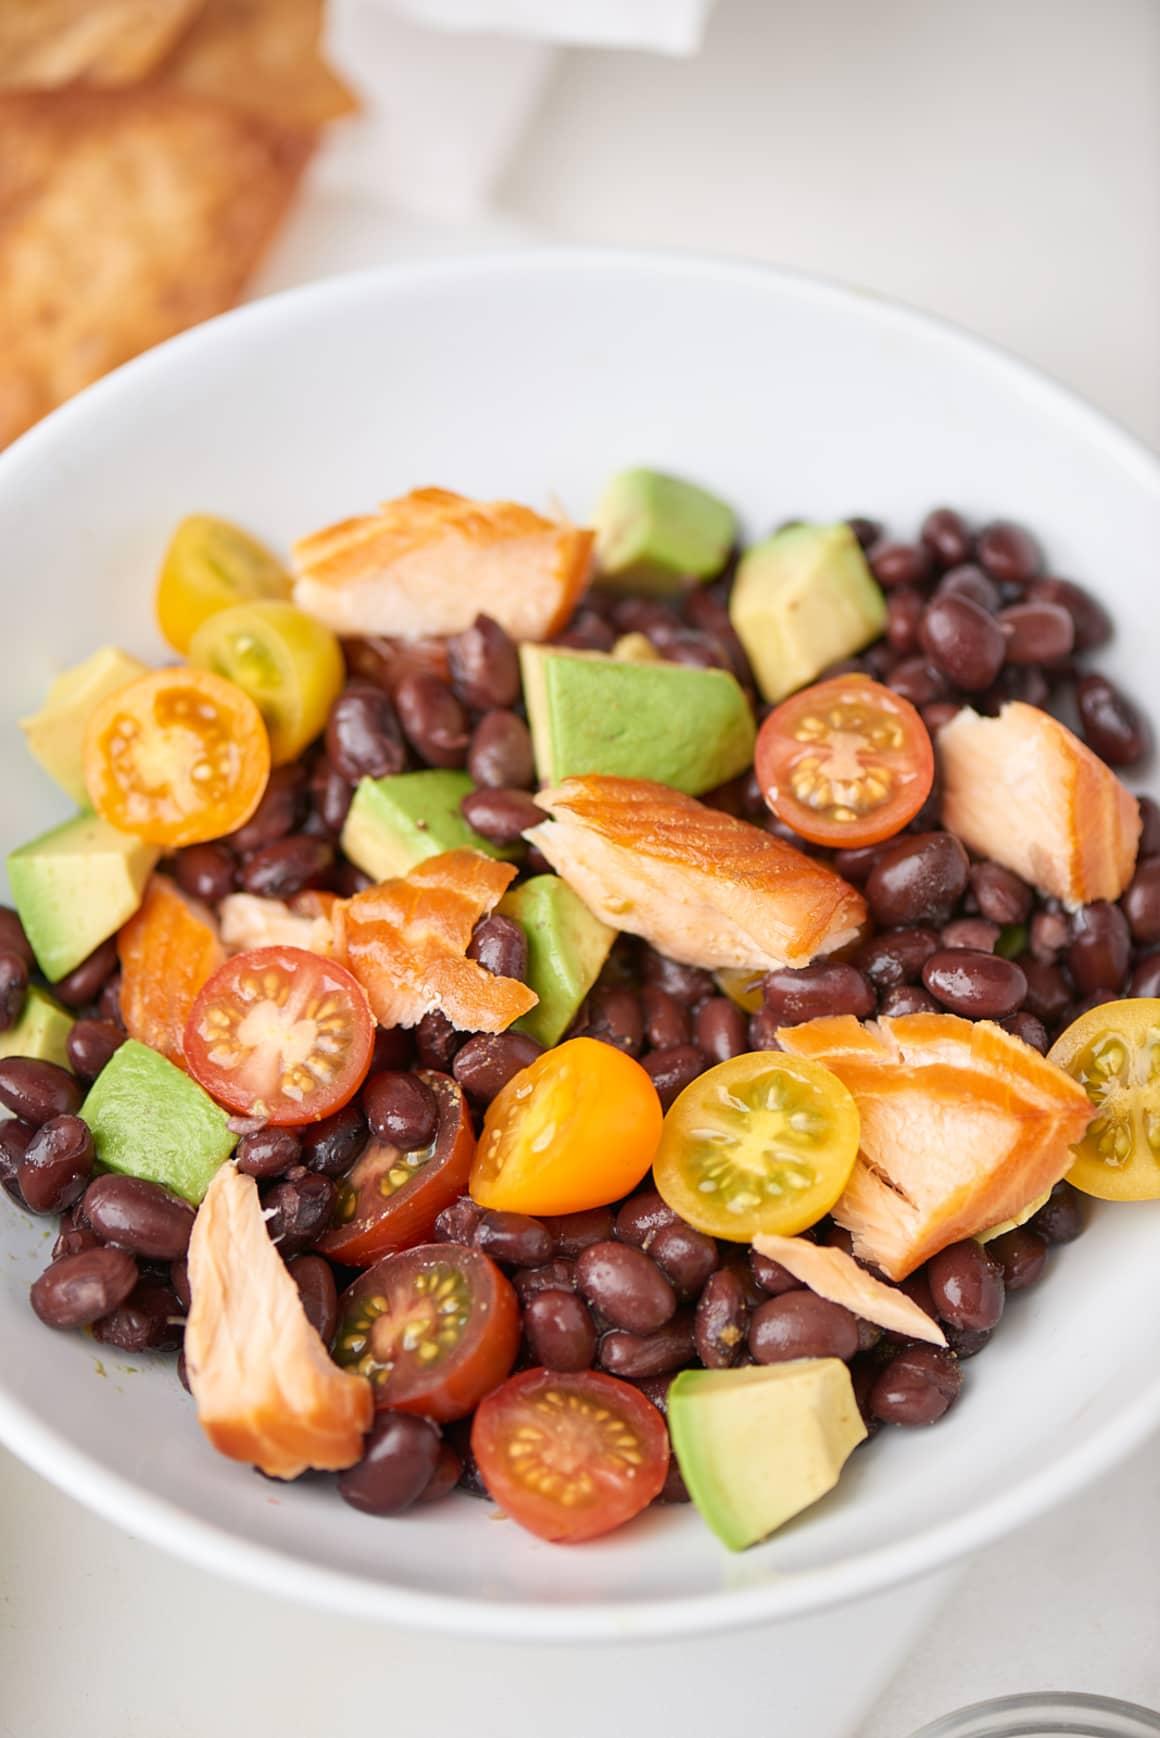 Spicy Salmon Black Bean Salad